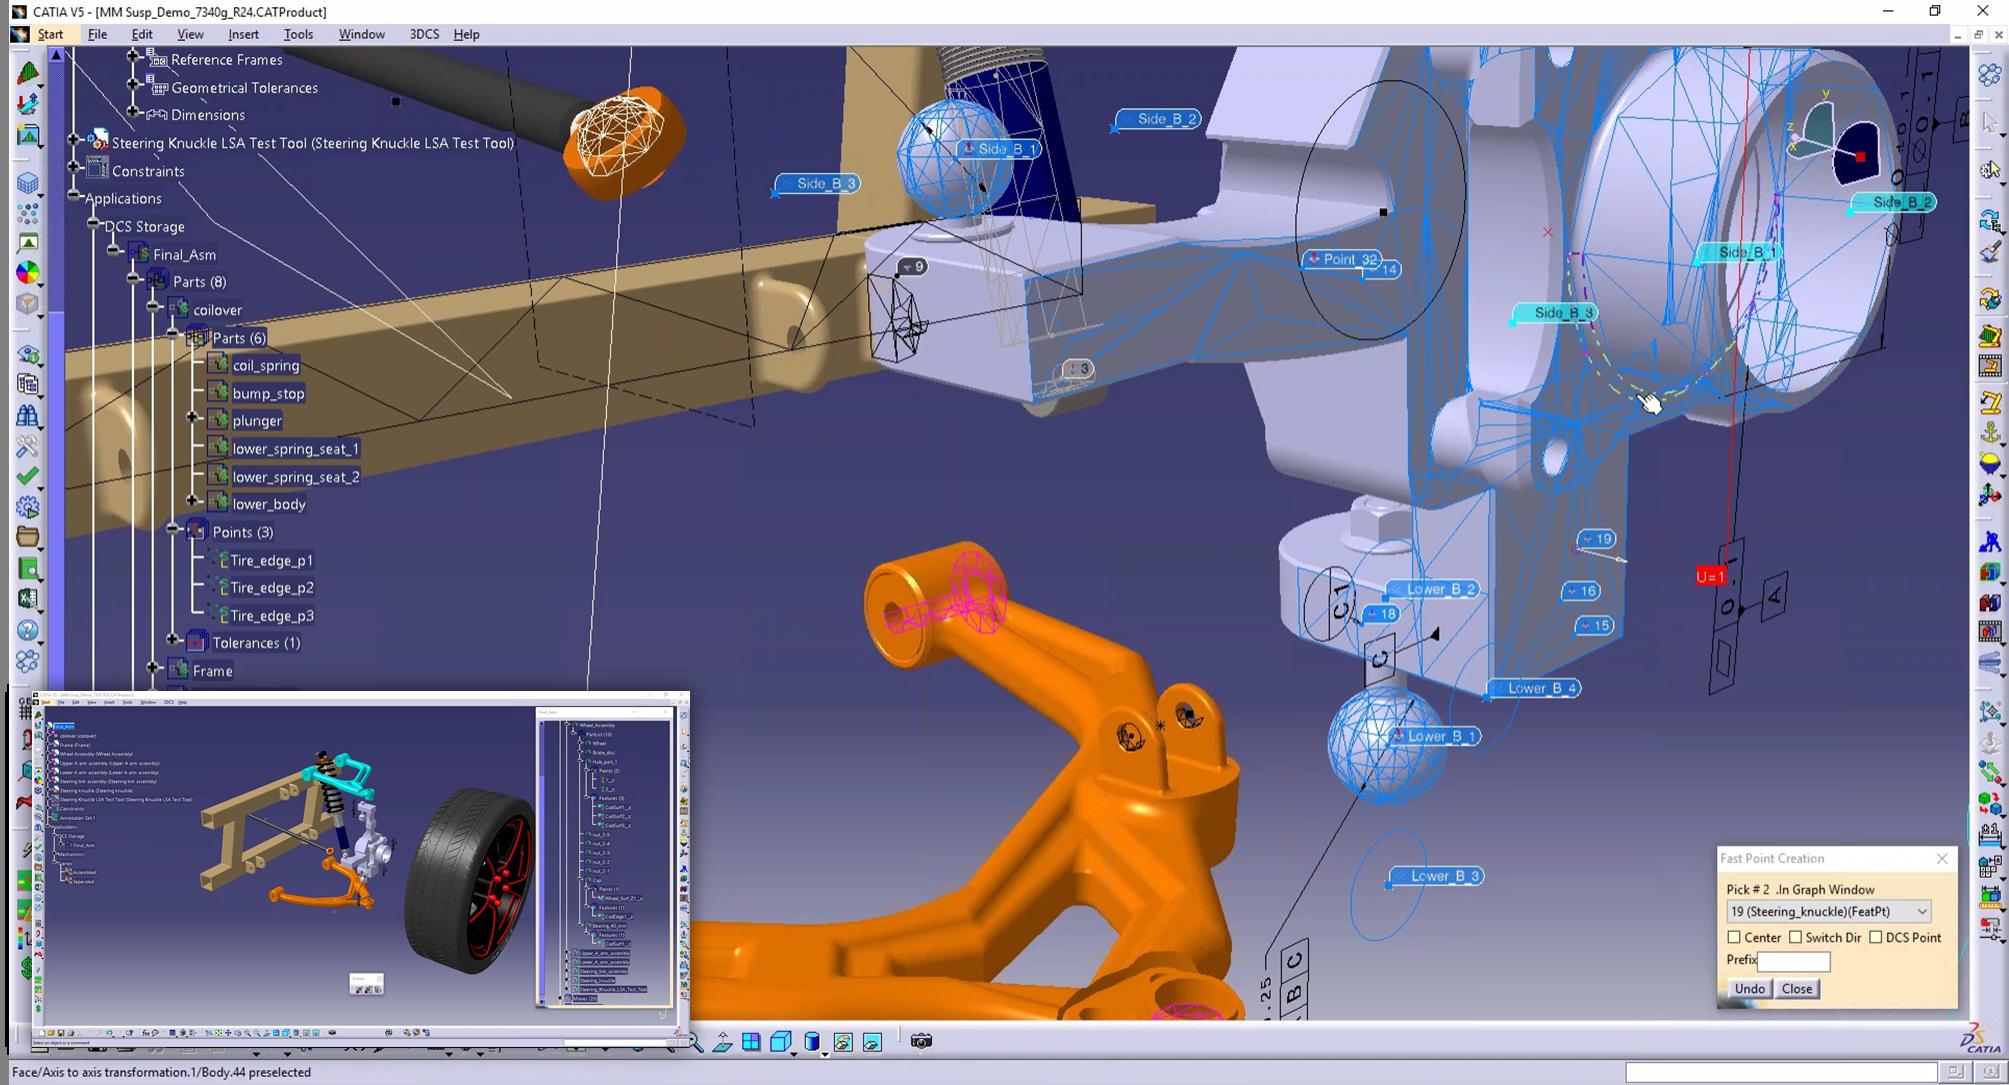 suspension-system-3dcs-catia-v5